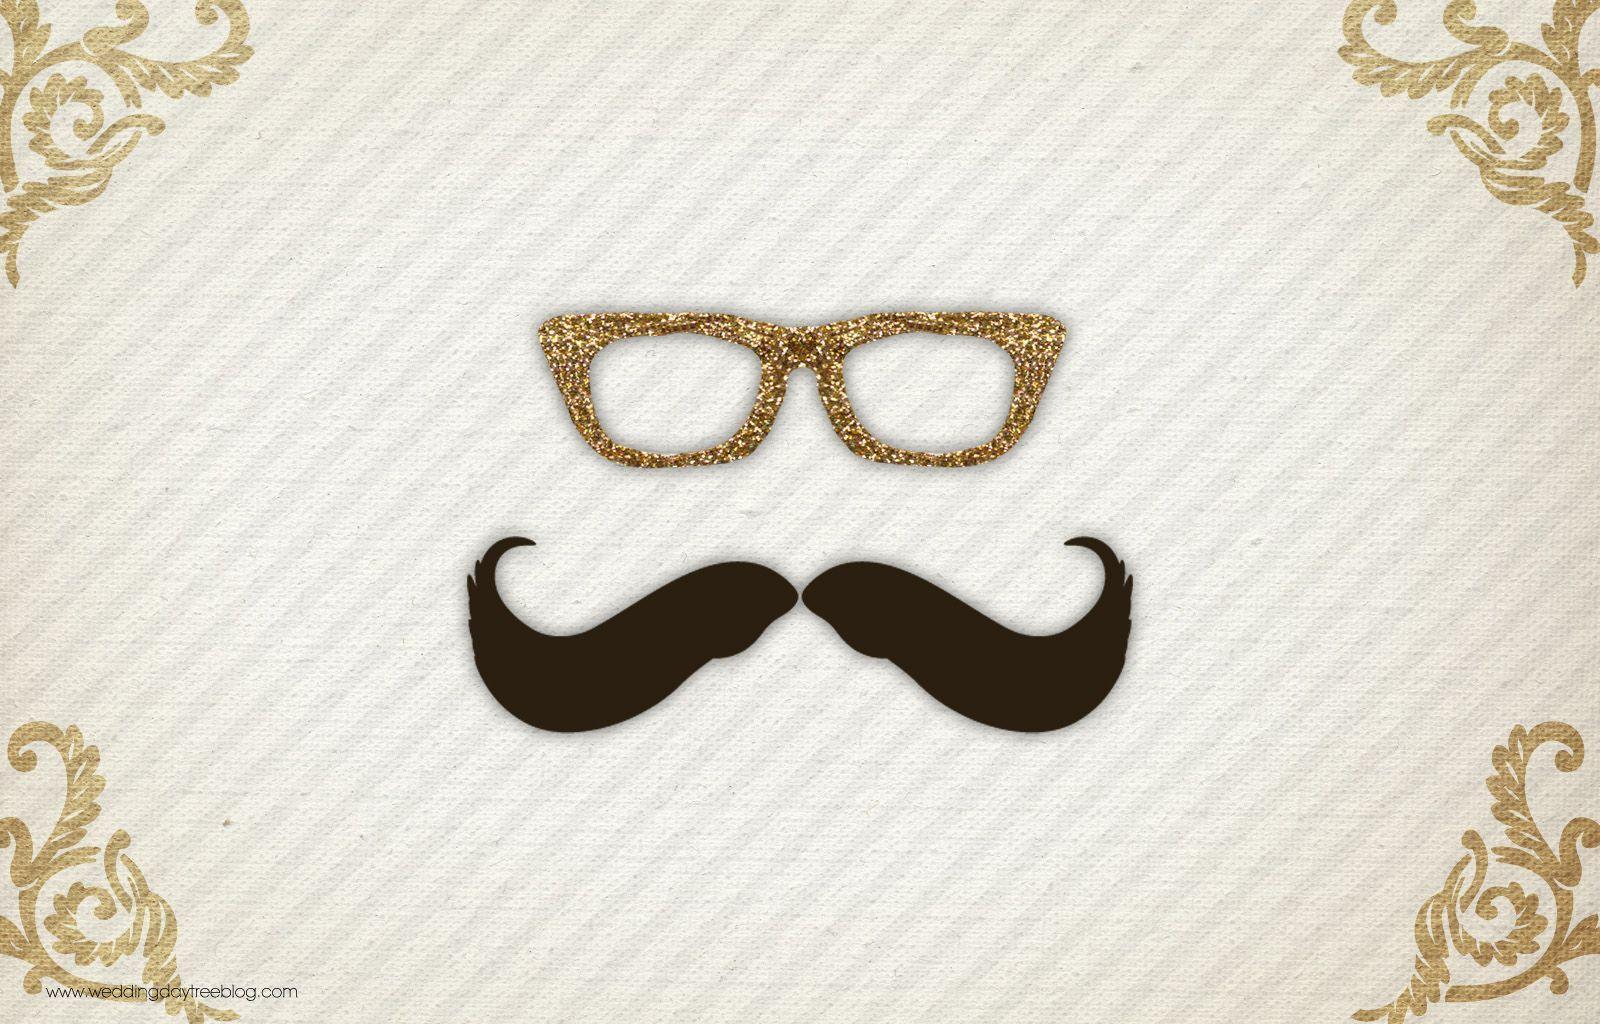 Cute Mustache Wallpapers For Iphone Mustache Desktop Backgrounds Wallpaper Cave